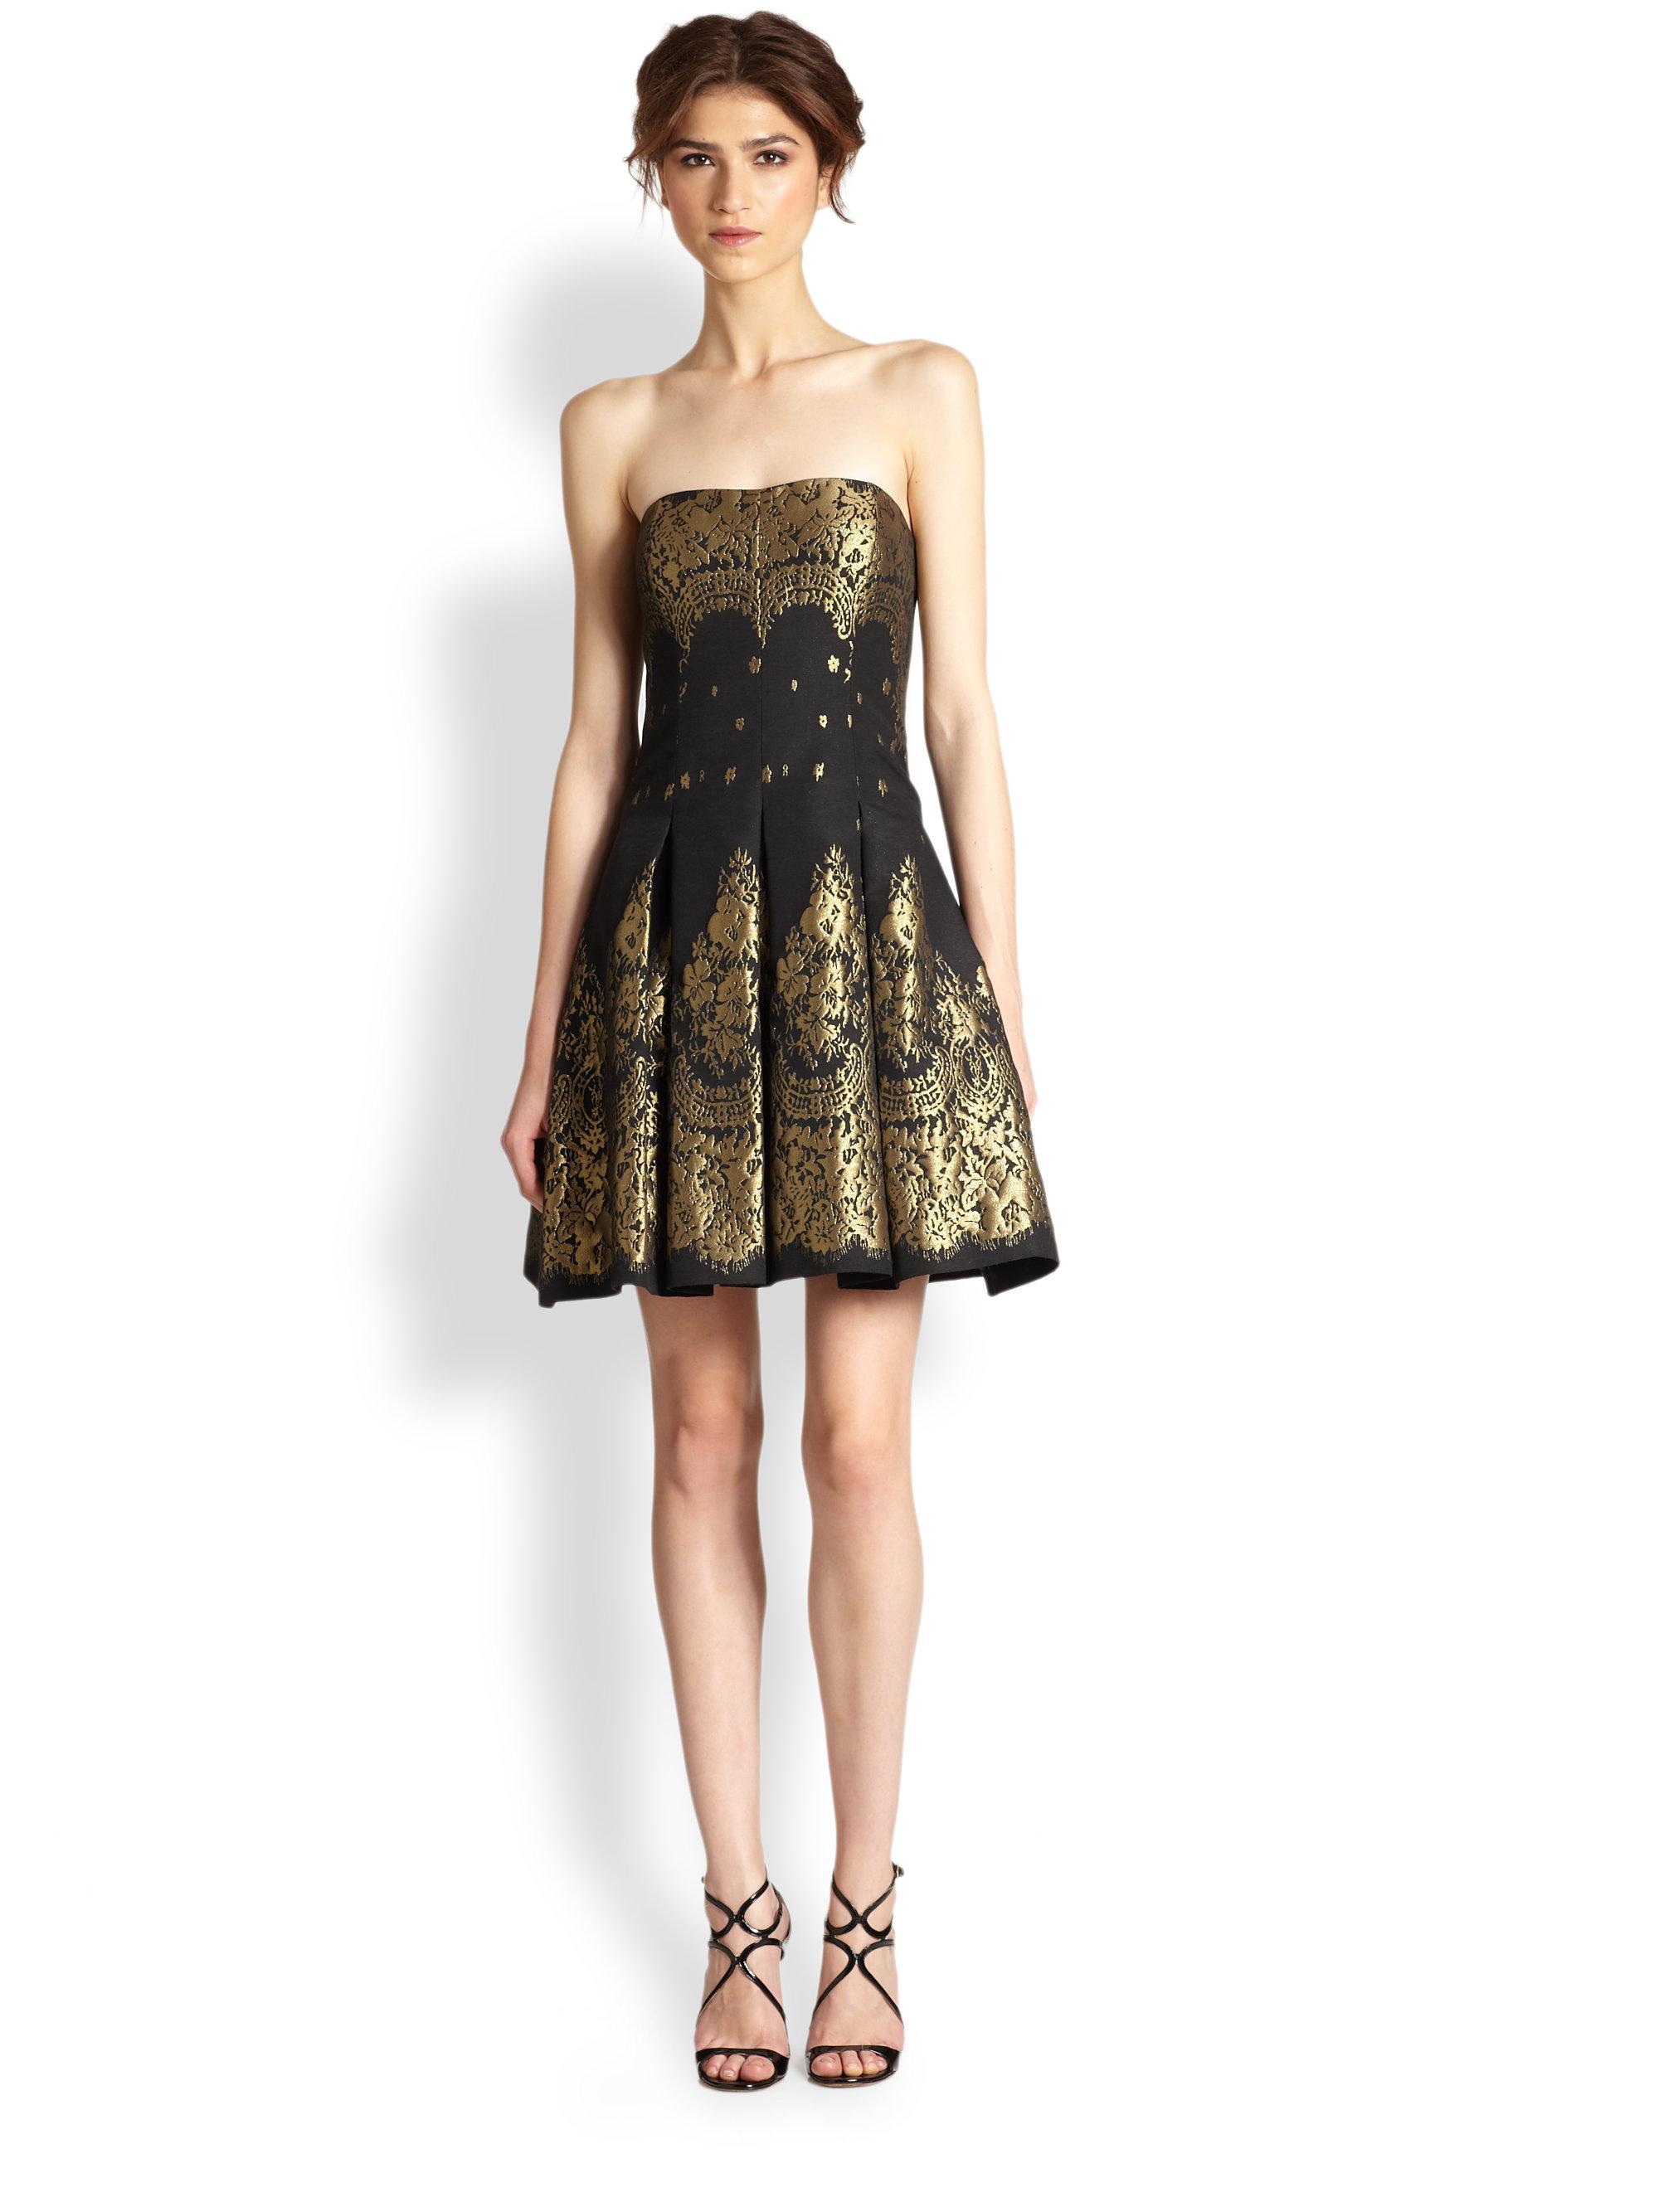 Lyst Aidan Mattox Strapless Brocade Dress In Black